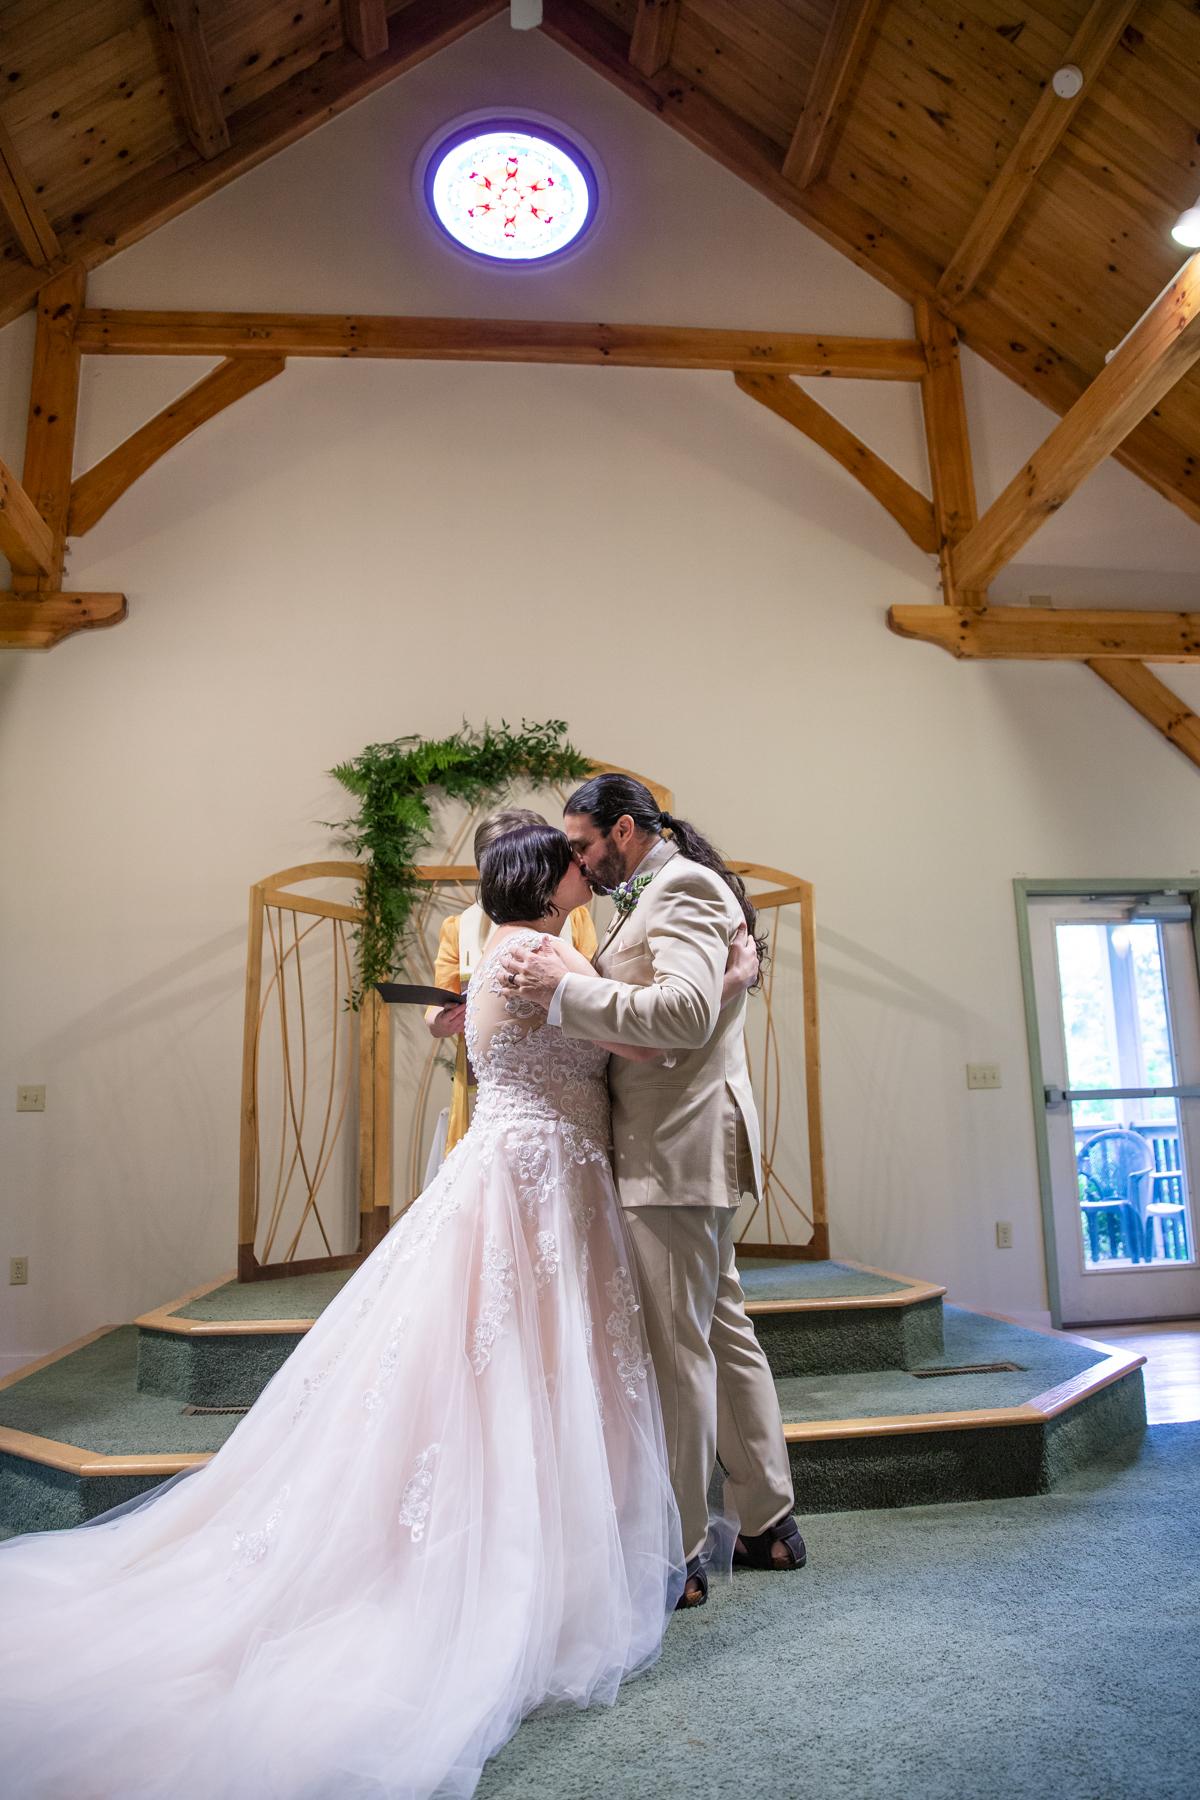 Avyanna and Phoenix Wedding- Photos by Studio Misha_BLOG-168.jpg